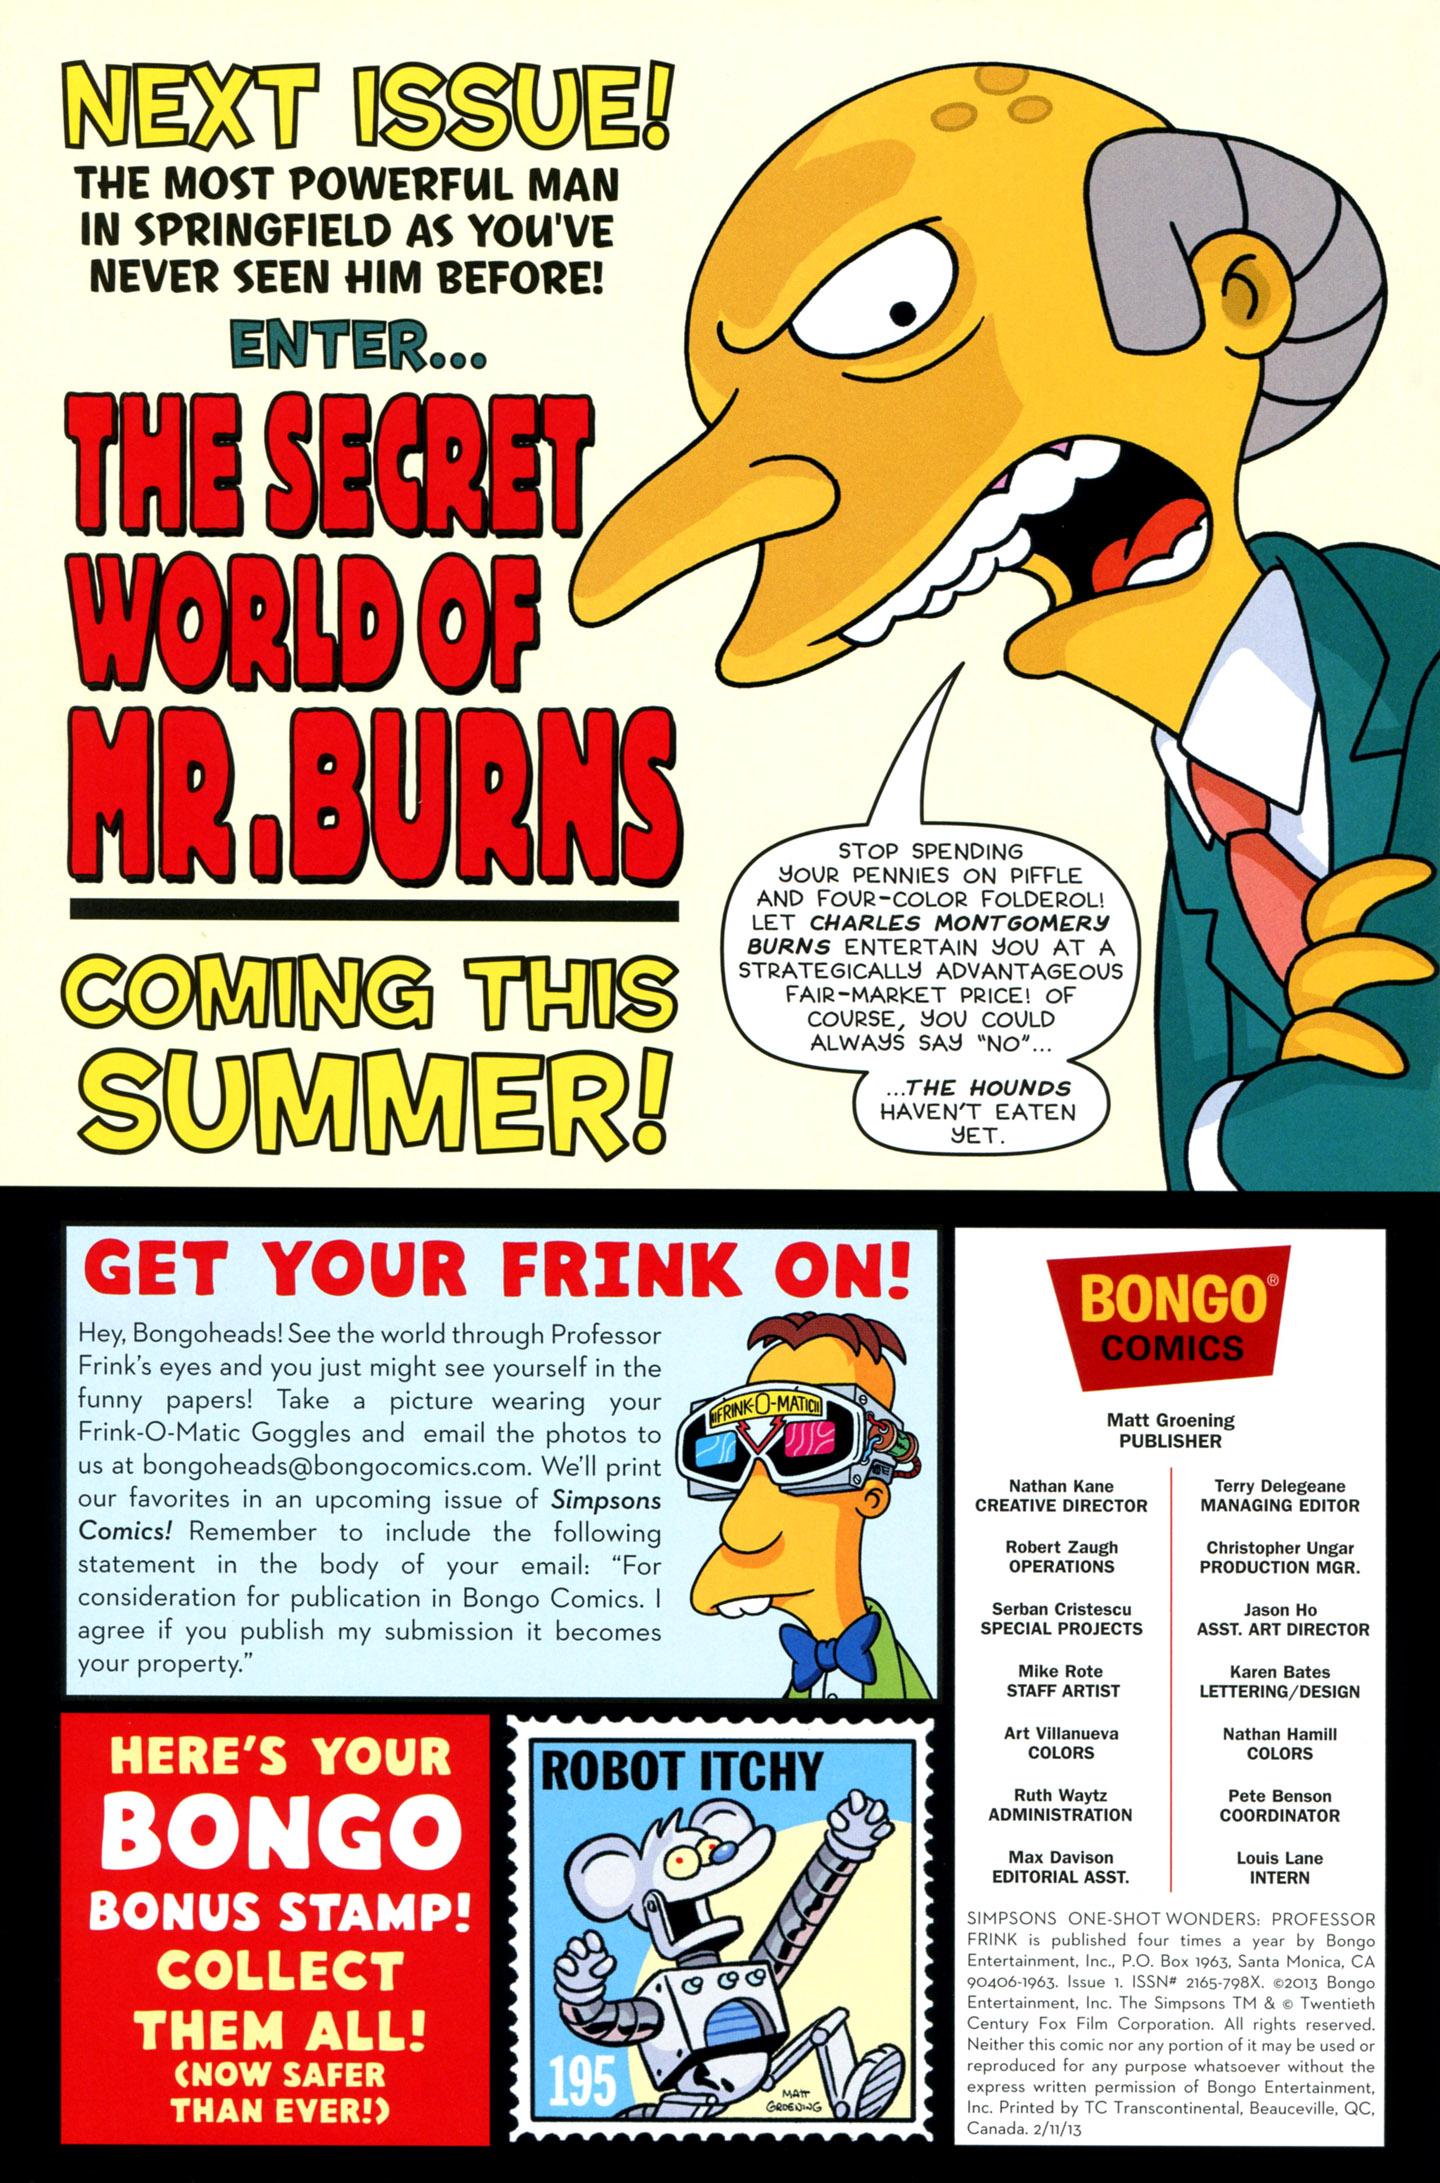 Read online Simpsons One-Shot Wonders: Professor Frink comic -  Issue # Full - 30